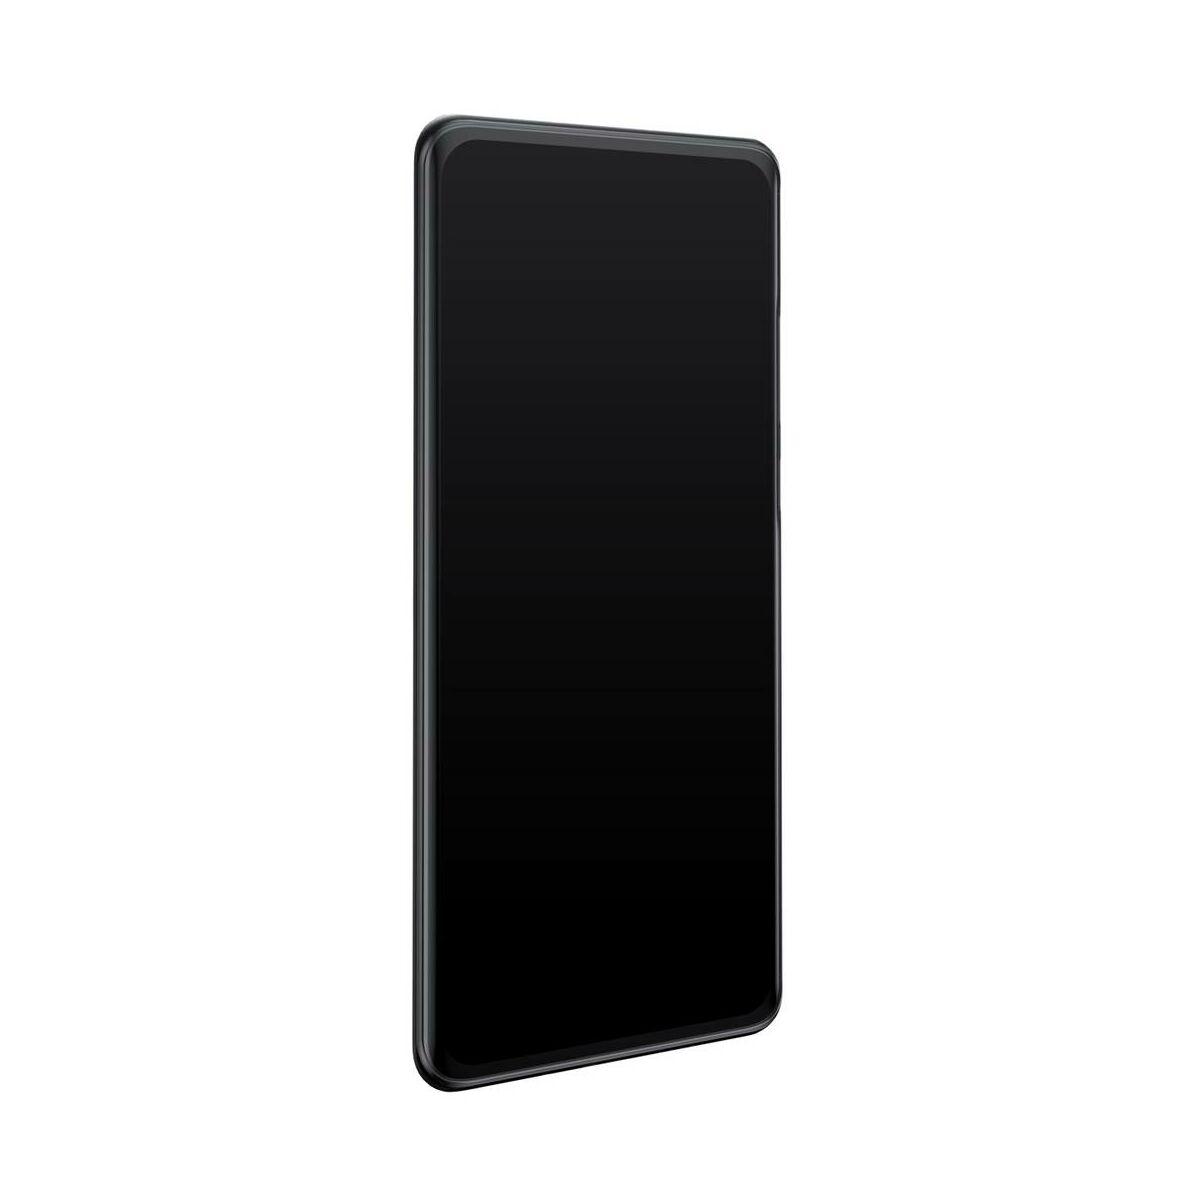 Baseus Huawei P30 tok, Wing, átlátszó fekete (WIHWP30-01)